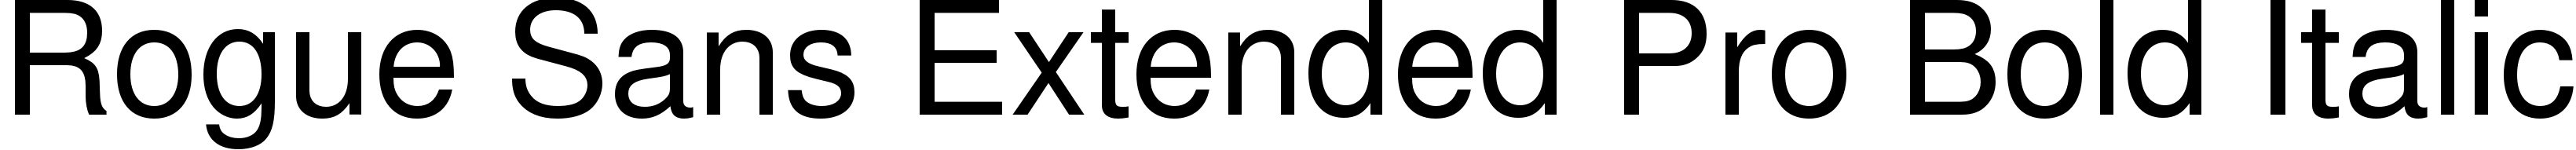 Rogue Sans Extended Pro Bold Italic